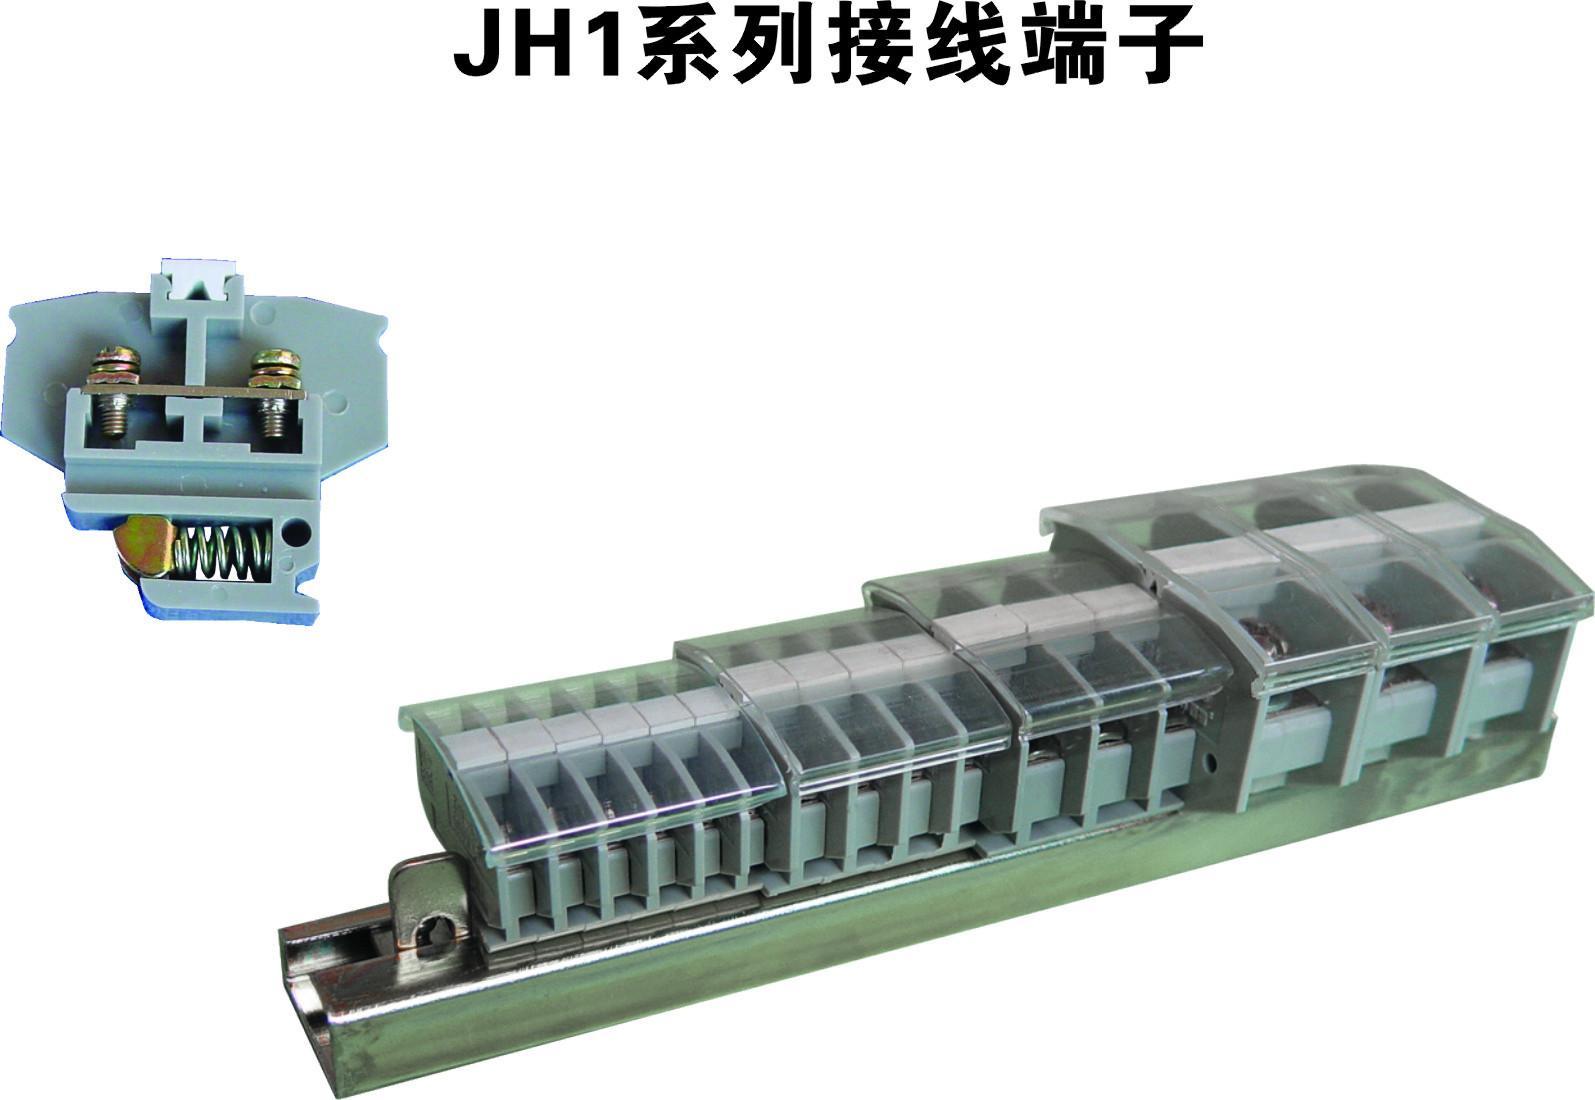 JH1系列接线端子